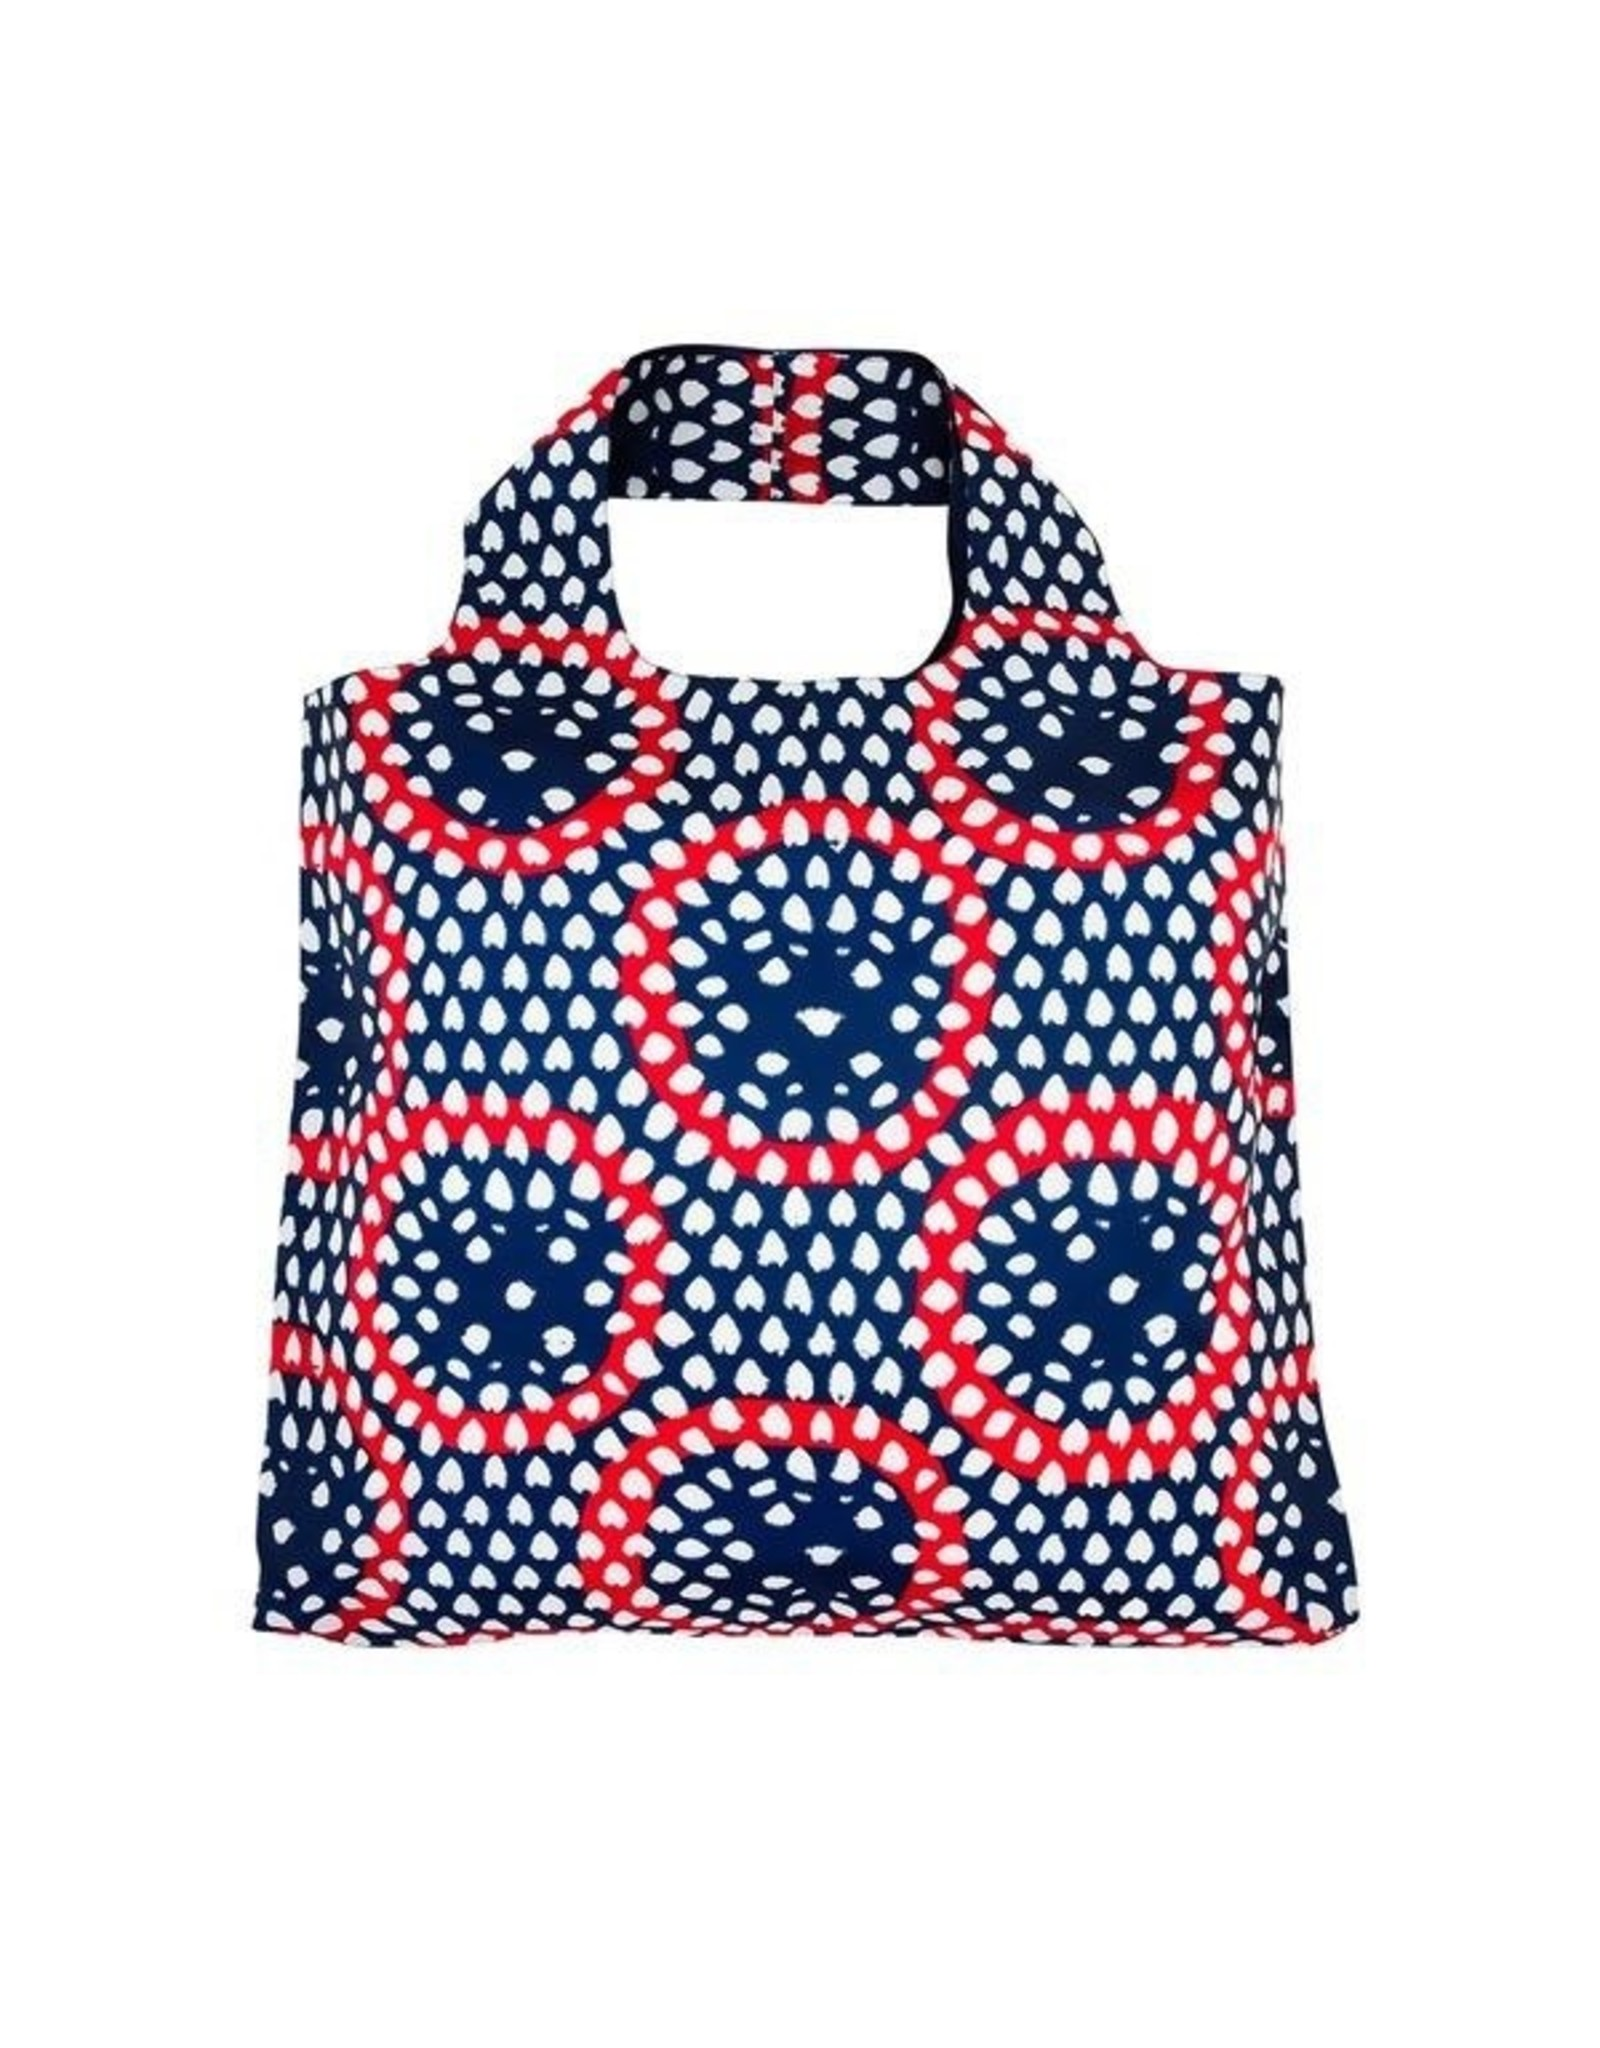 Envirosax Tokyo - Pocket Sized Reusuable Bag from Envirosax